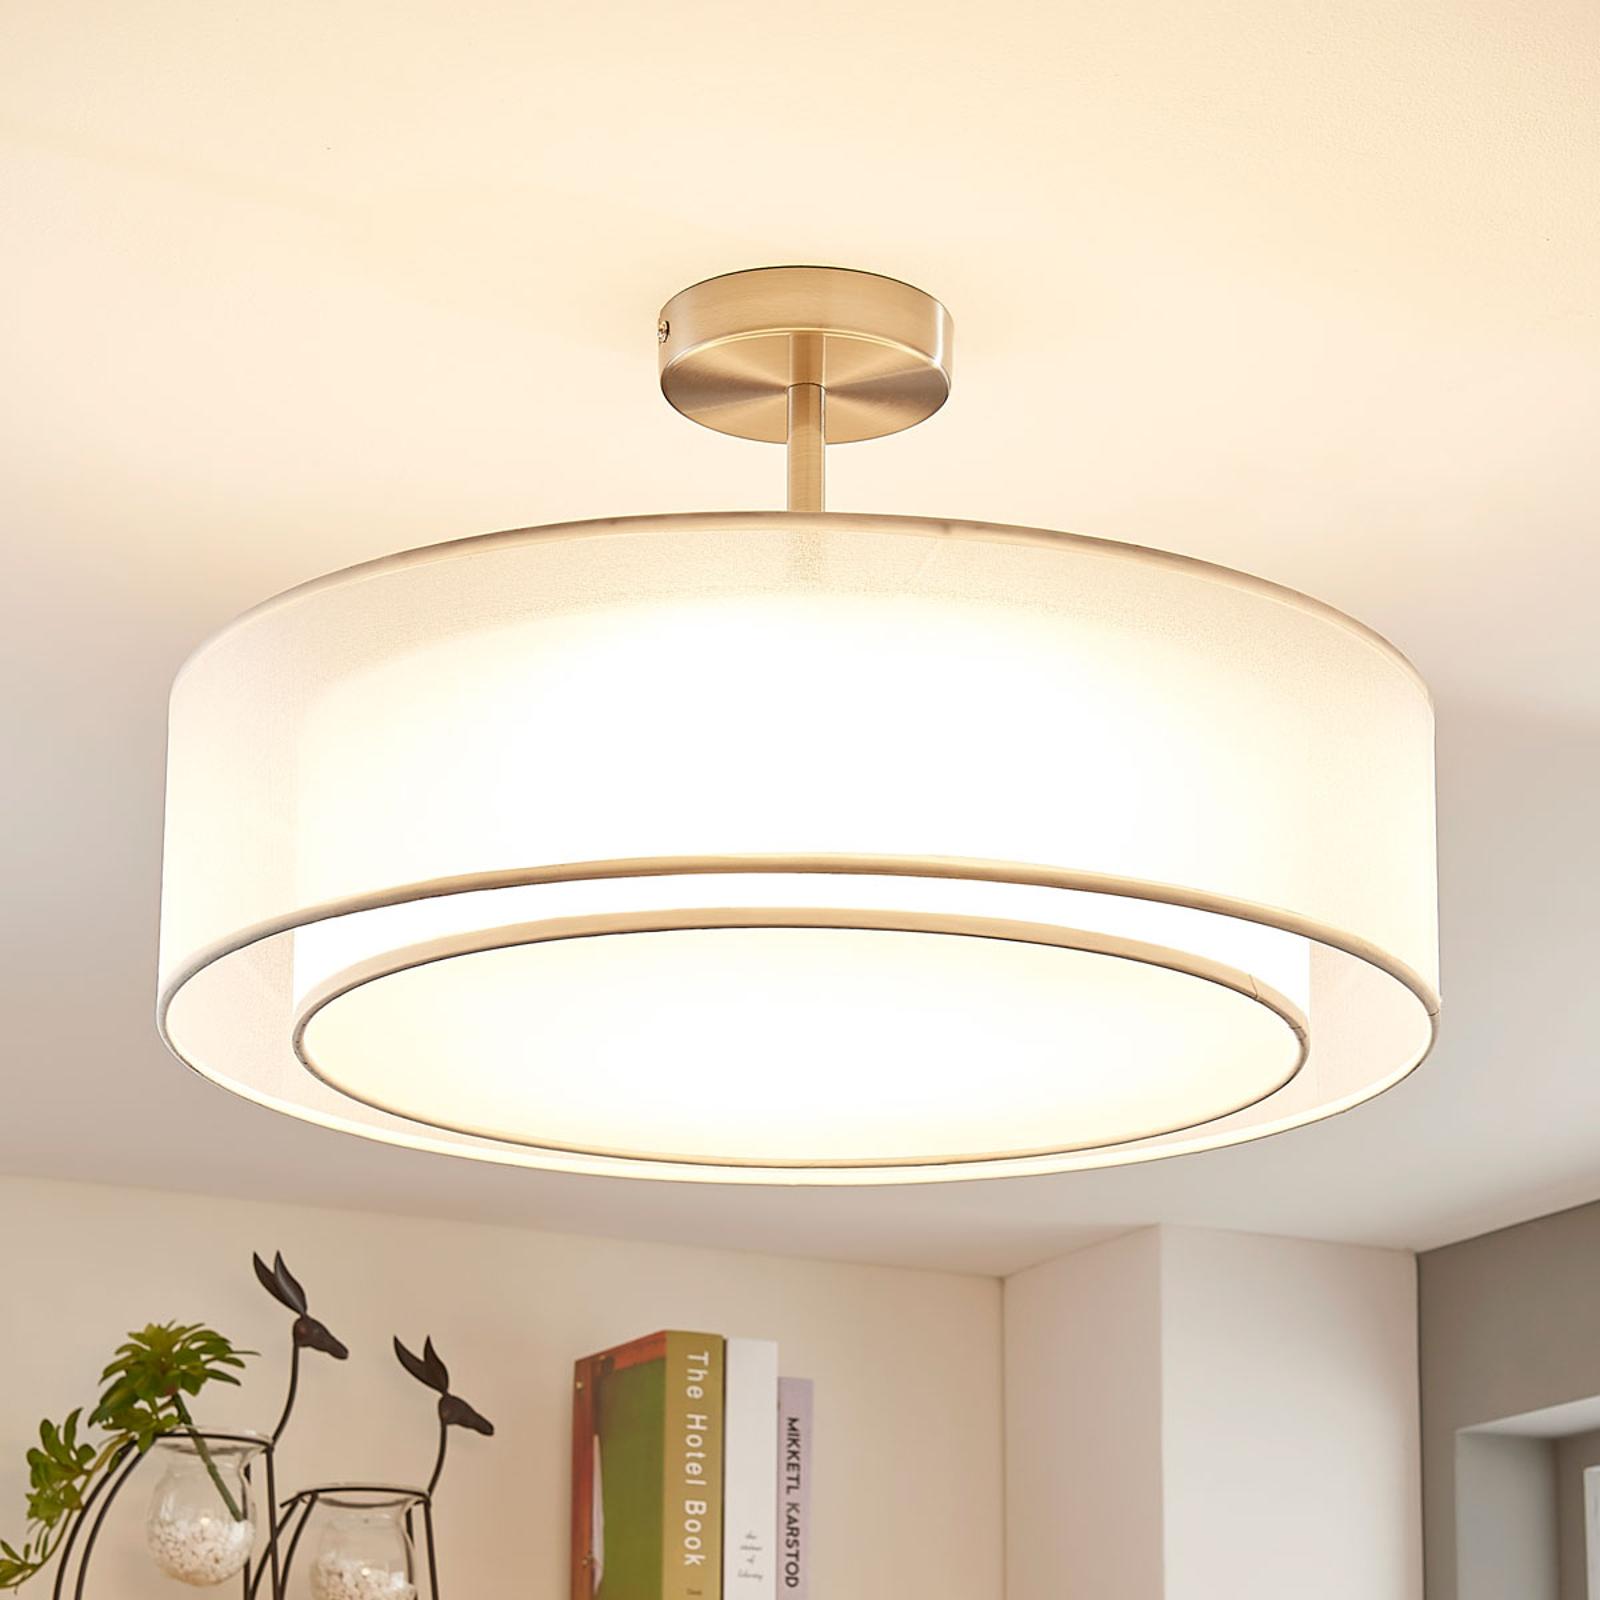 Plafonnier LED Pikka, dimmable 3 niveaux, blanc